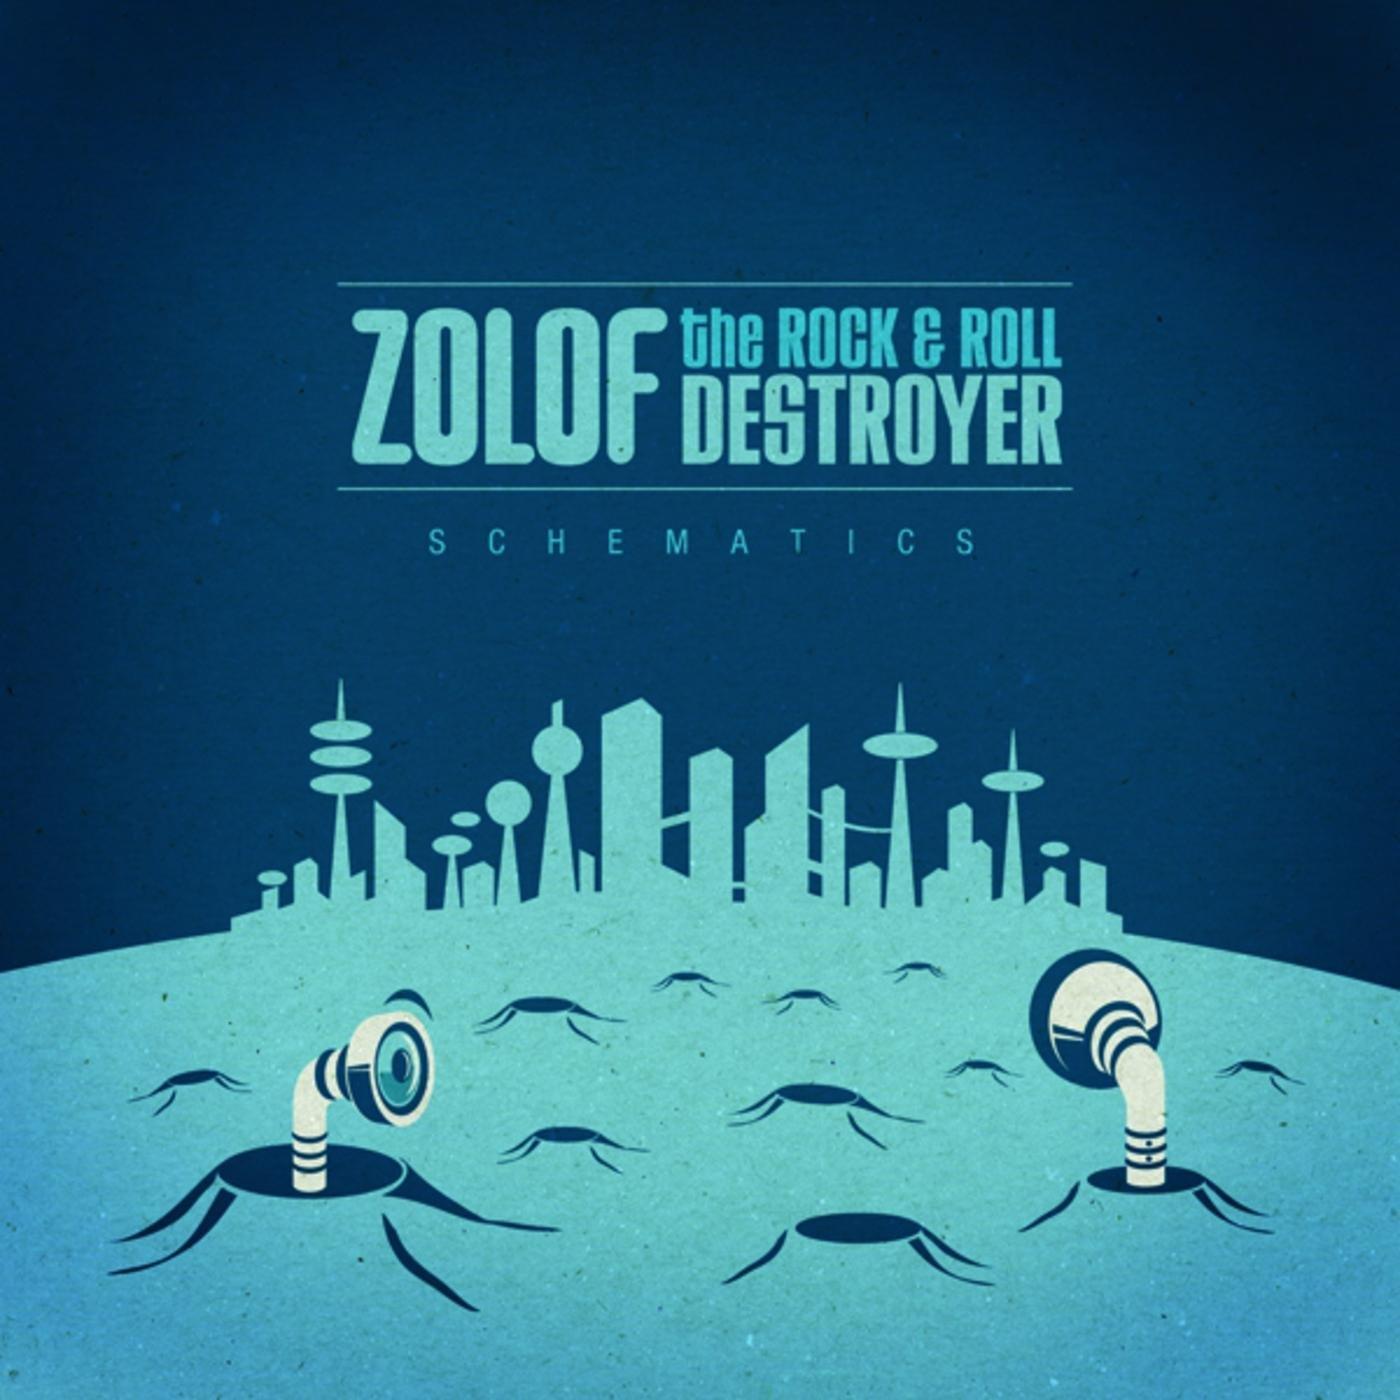 Zolof The Rock & Roll Destroyer - Schematics (2007) [FLAC] Download